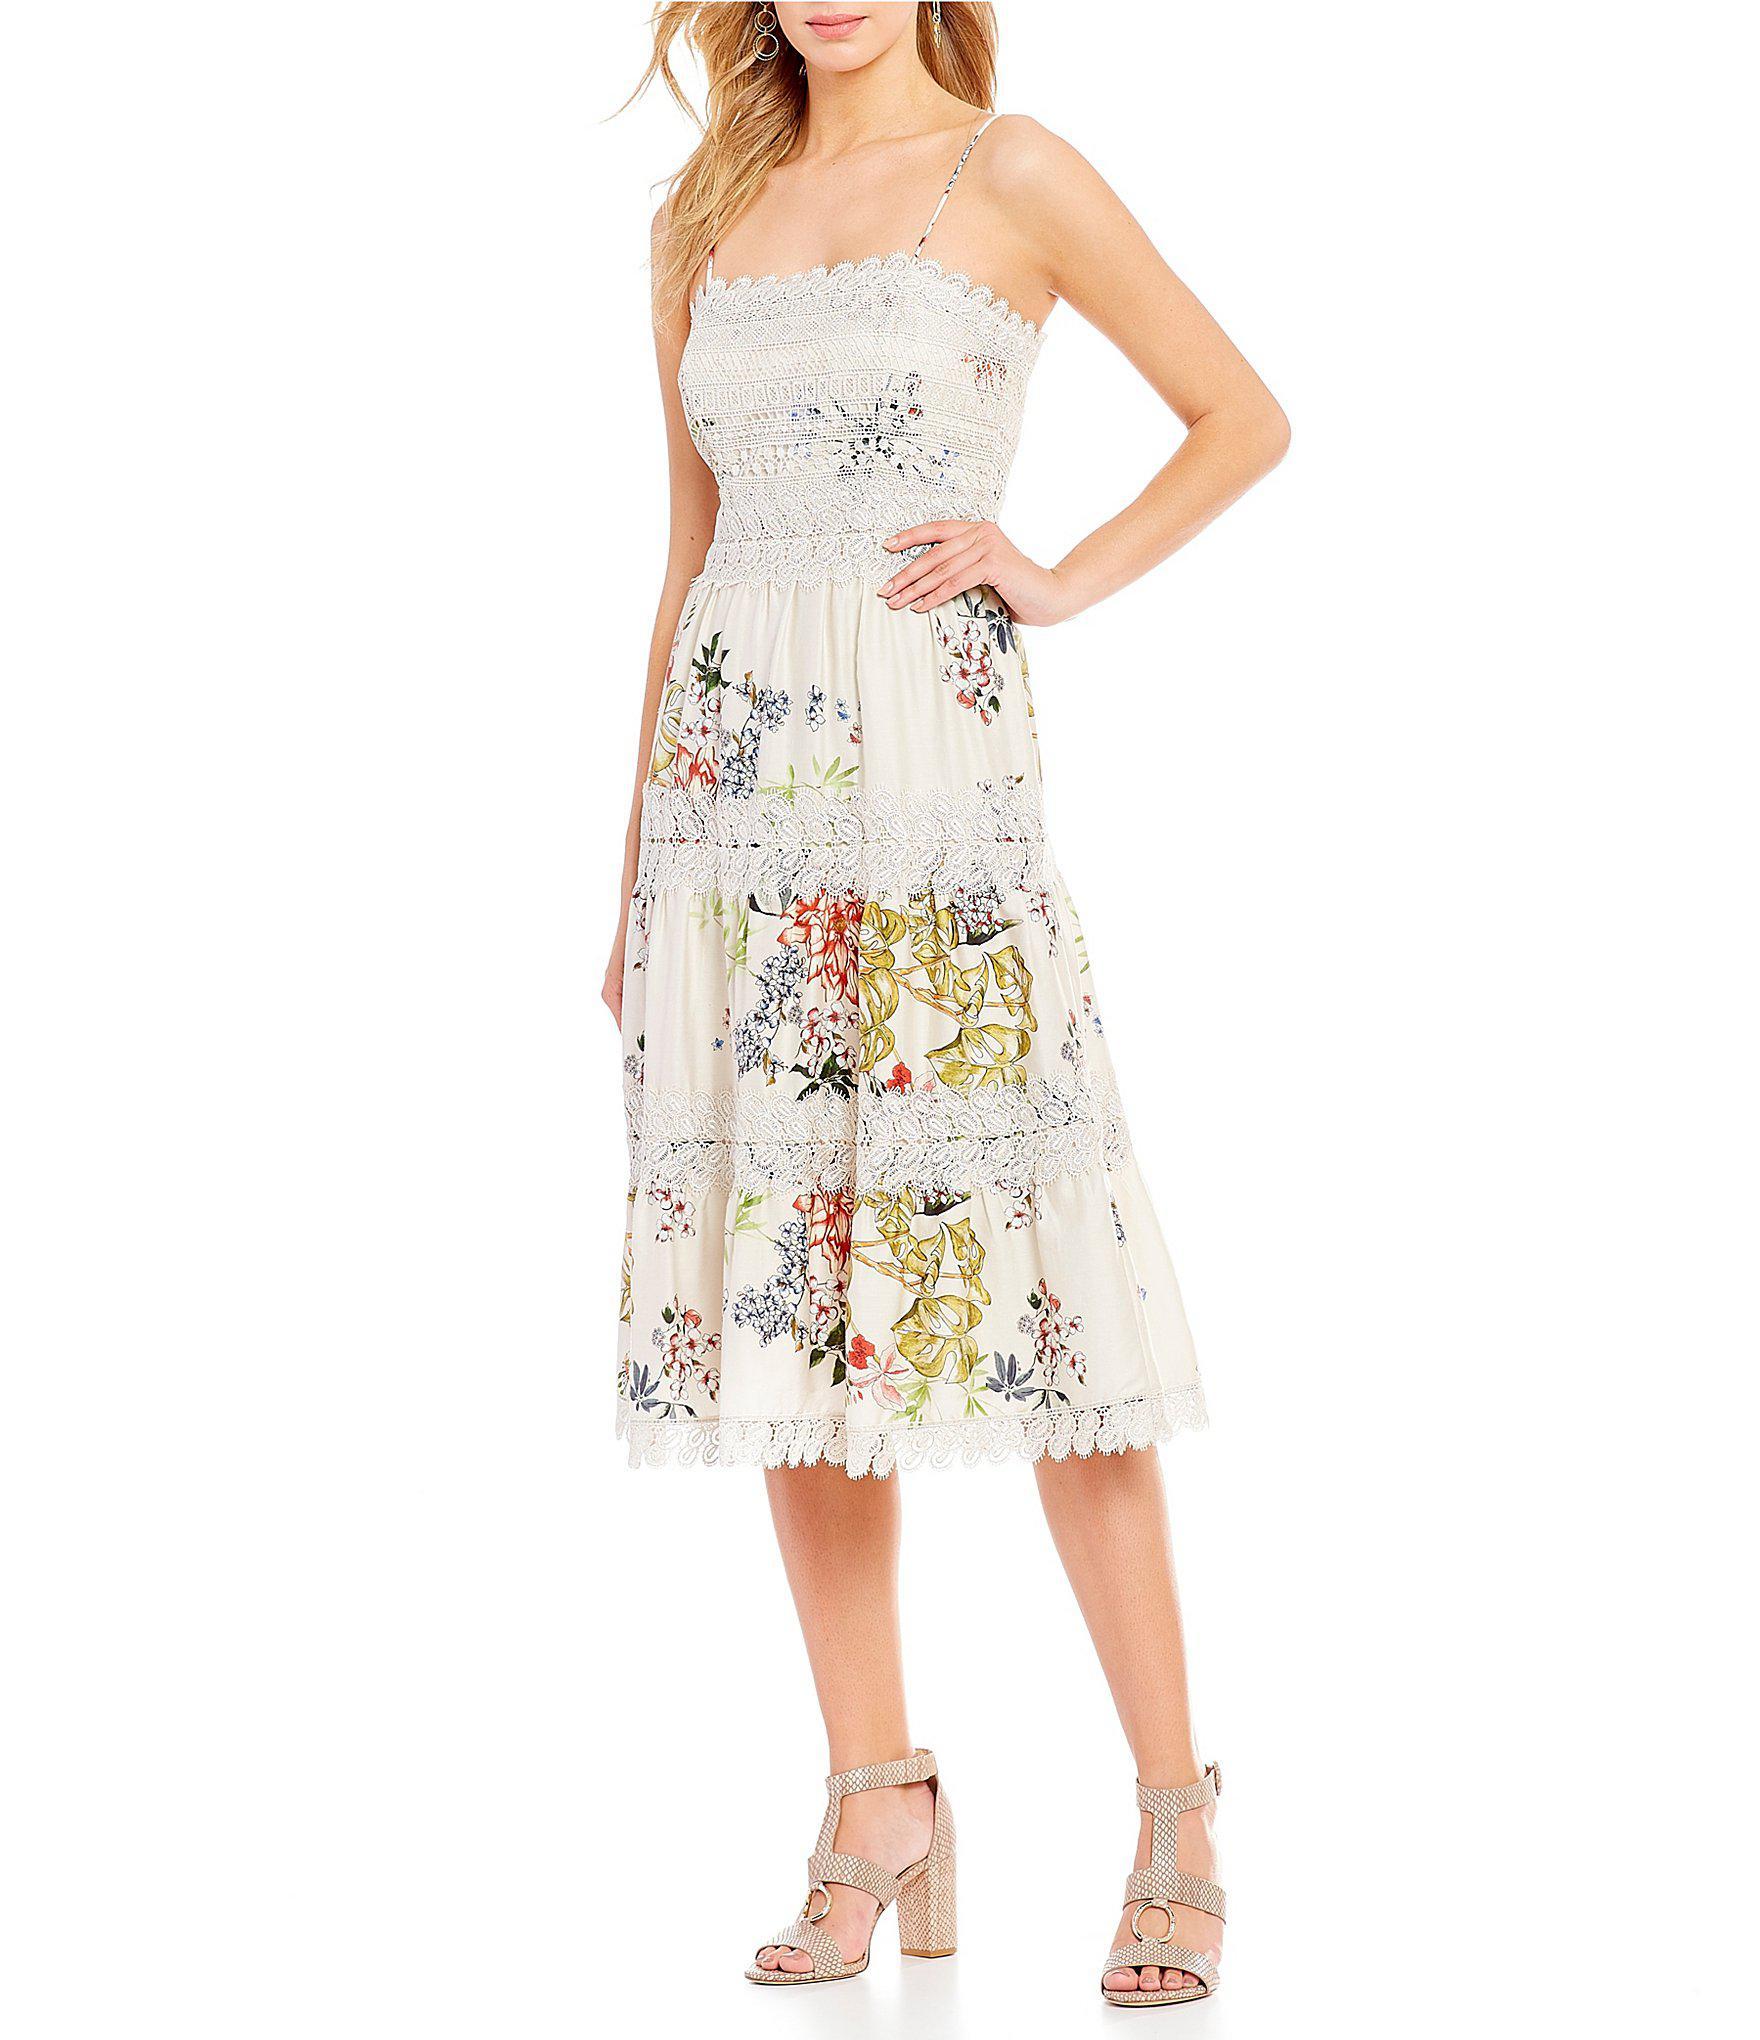 8a1bb758cc1ac Antonio Melani Edia Sateen Printed A-line Midi Dress - Lyst